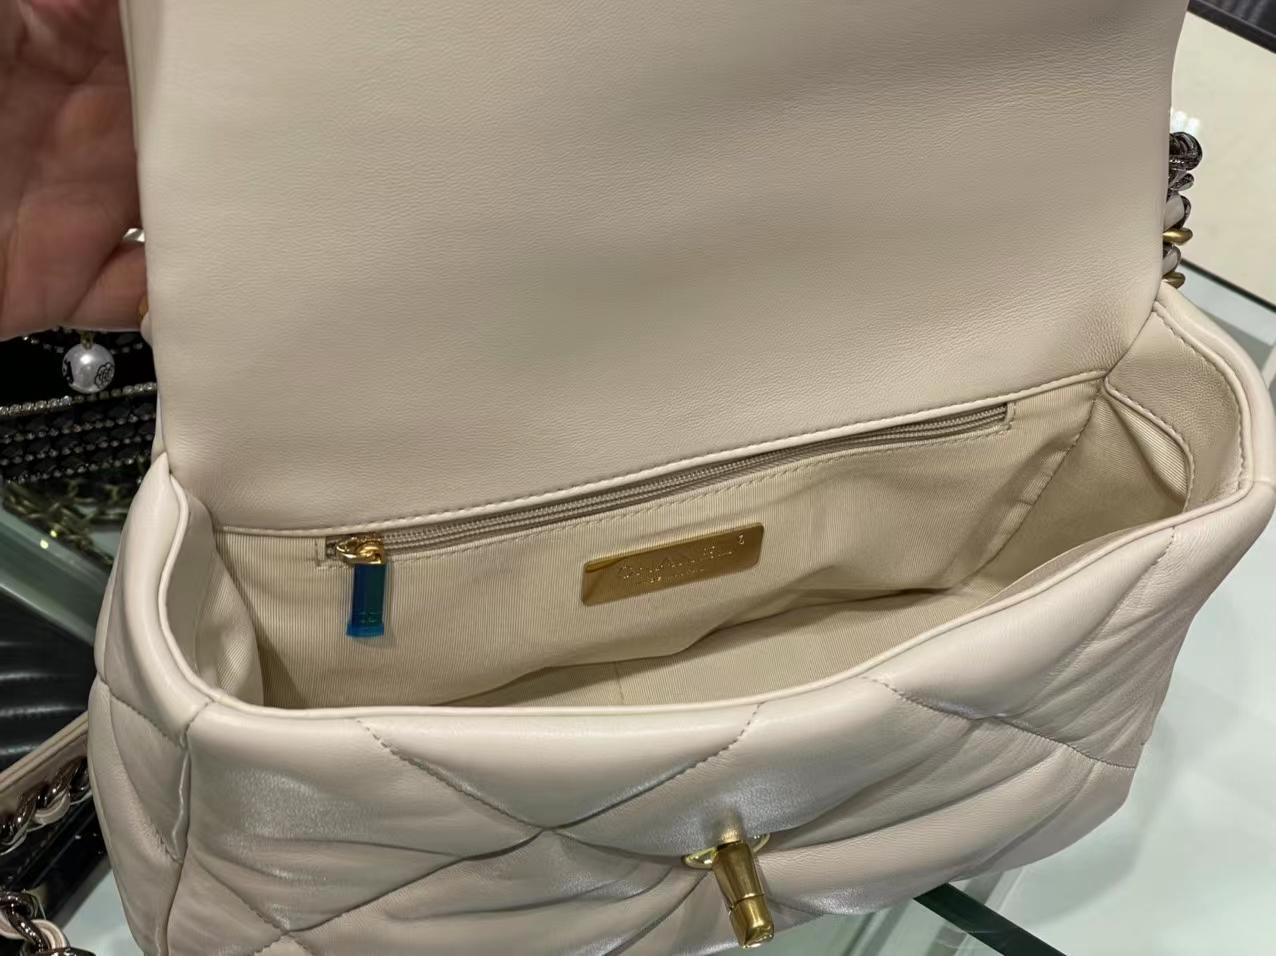 Chanel(香奈儿)19bag 最新 口盖包 亮面褶皱小羊皮 米白色 26cm